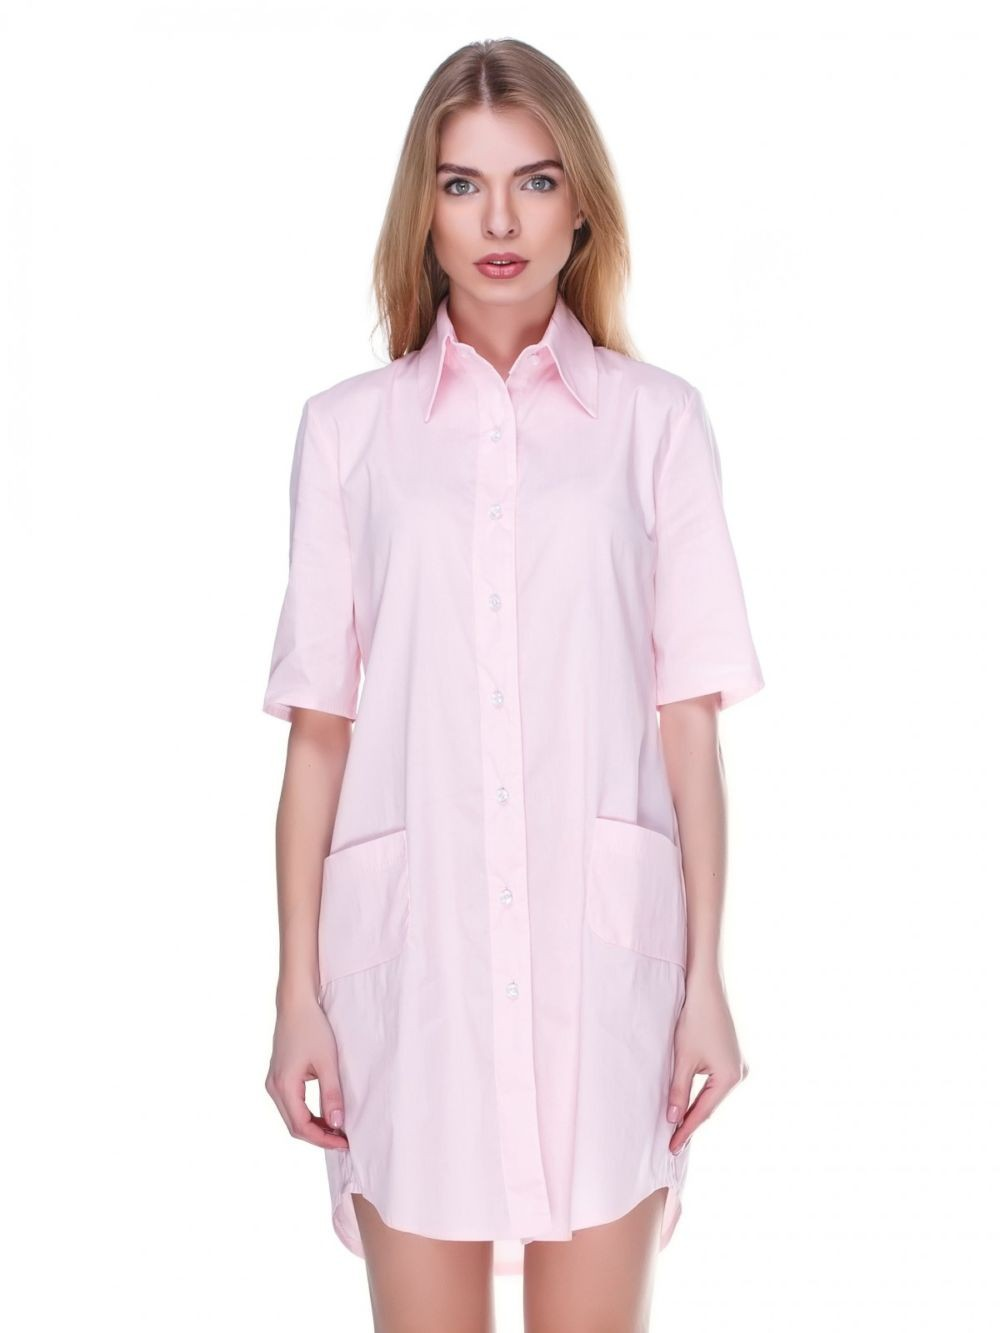 платье-рубашка розовое рукав короткий